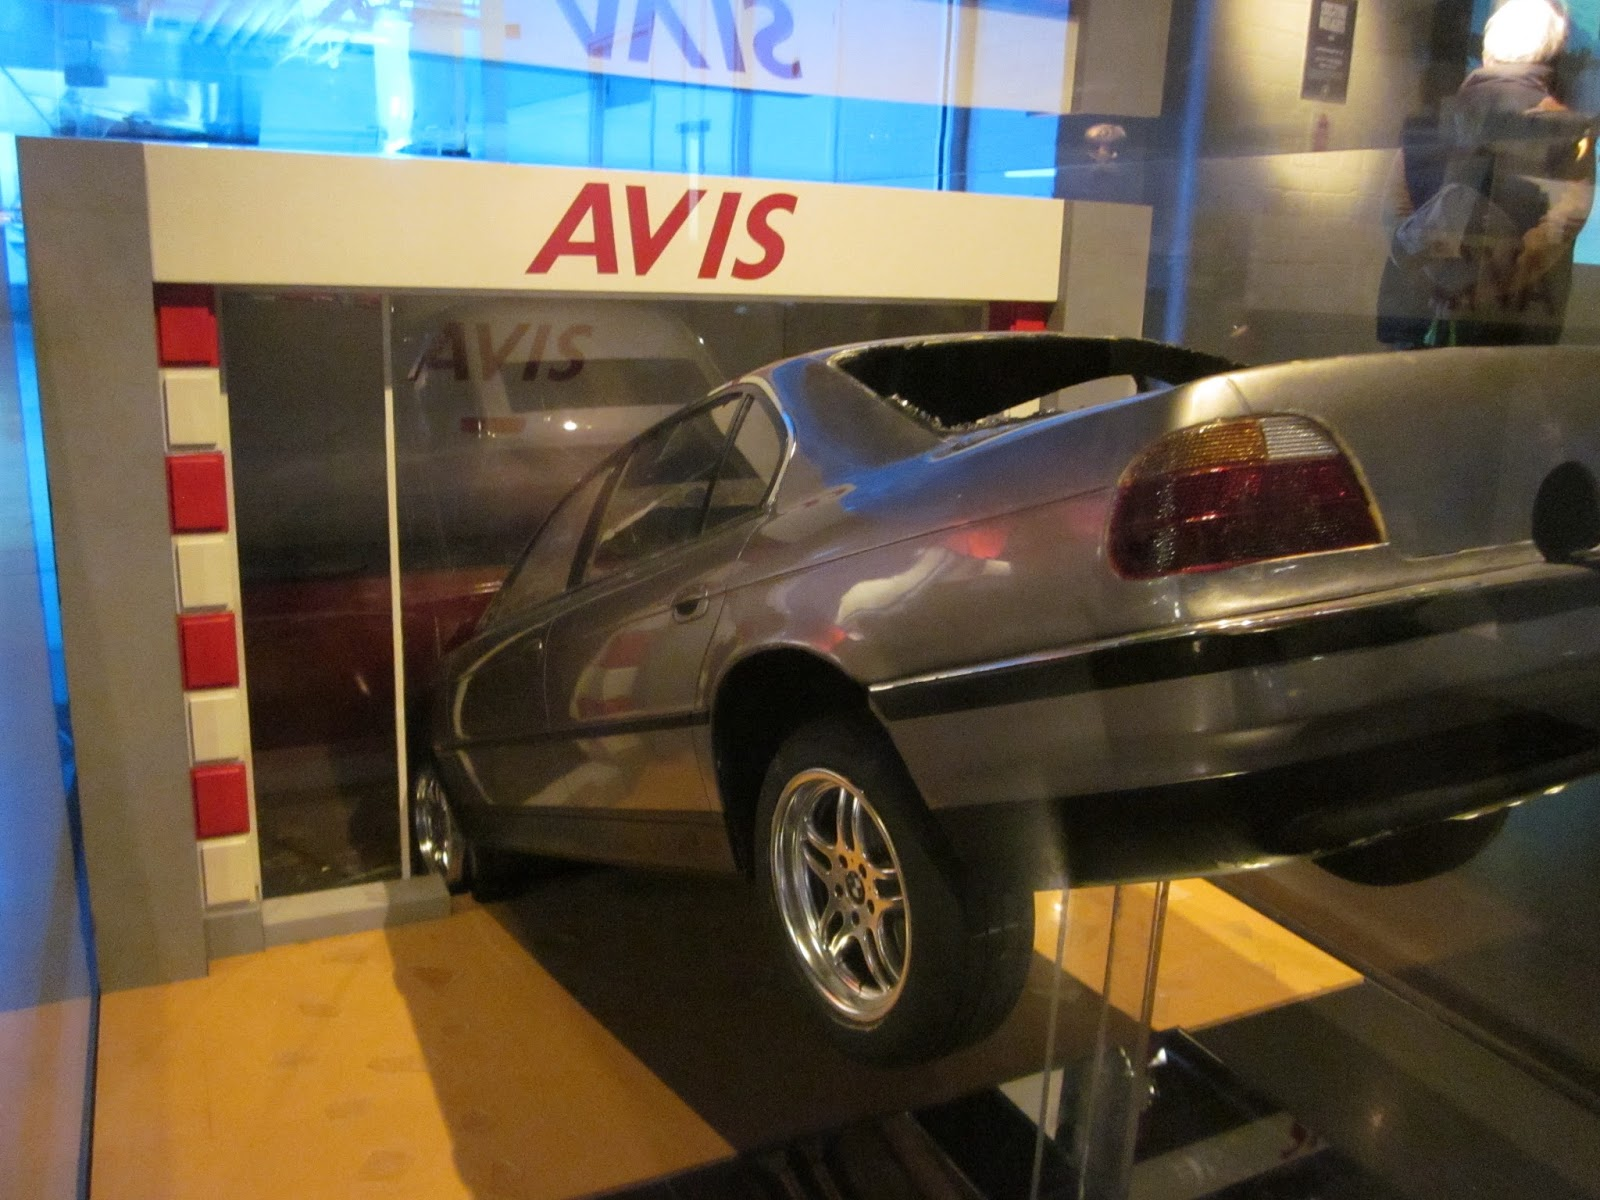 James Bond Locations: Bond's Rental Cars